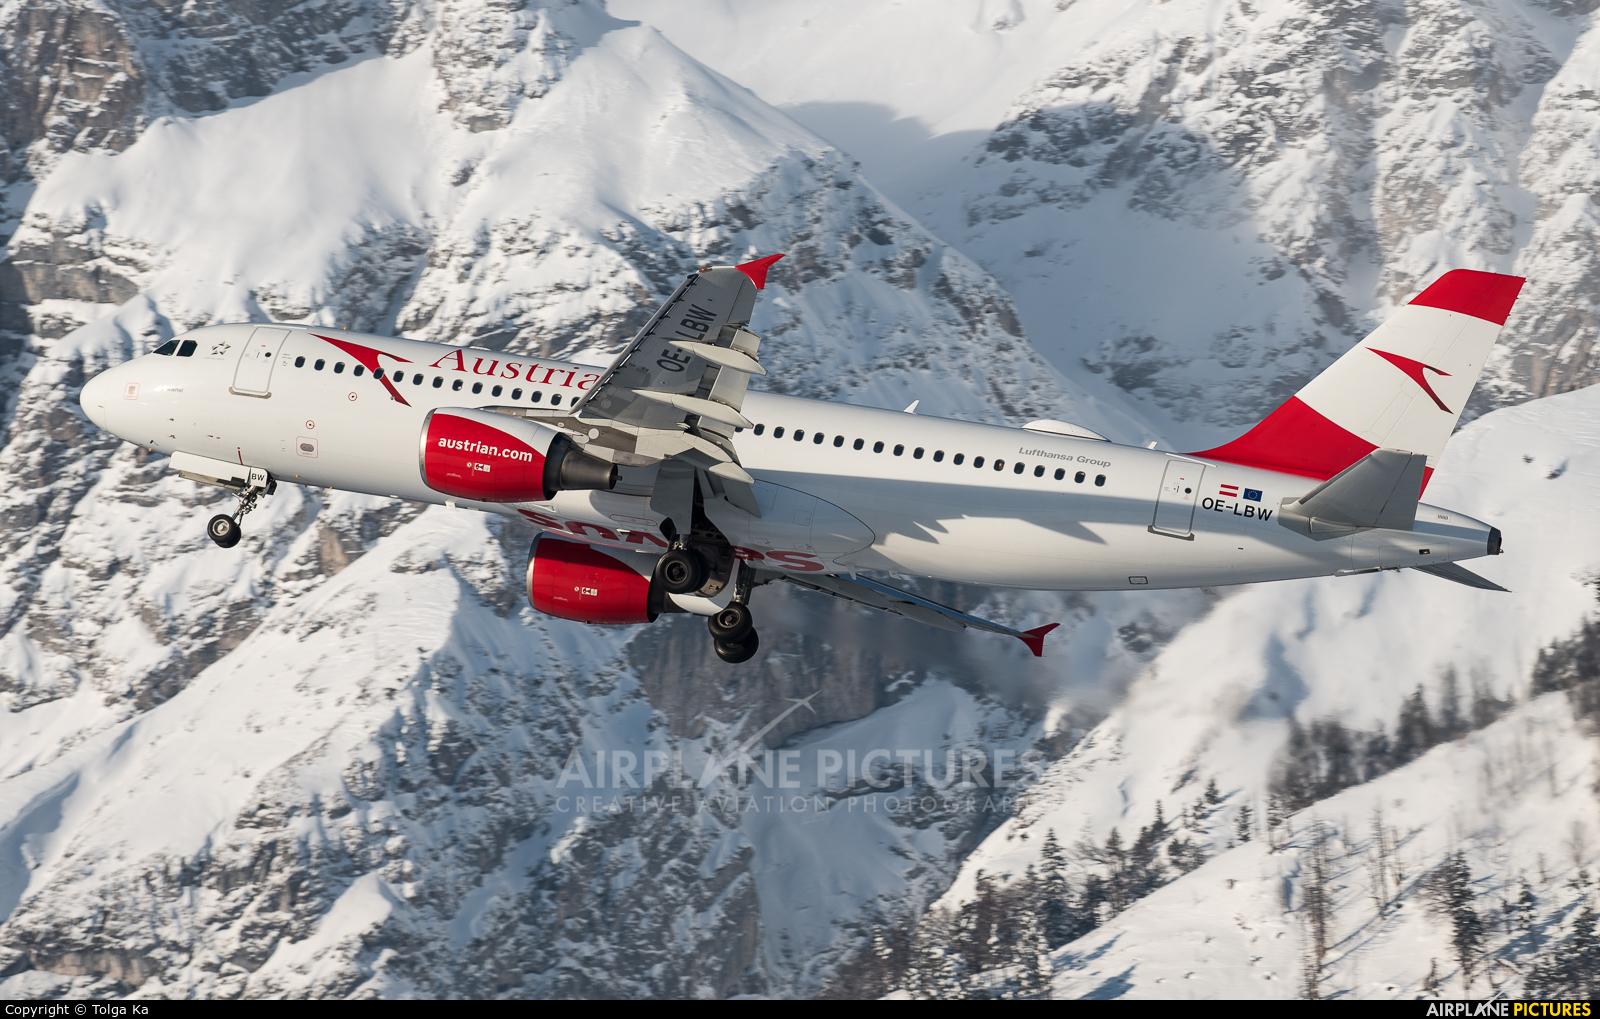 Austrian Airlines/Arrows/Tyrolean OE-LBW aircraft at Innsbruck